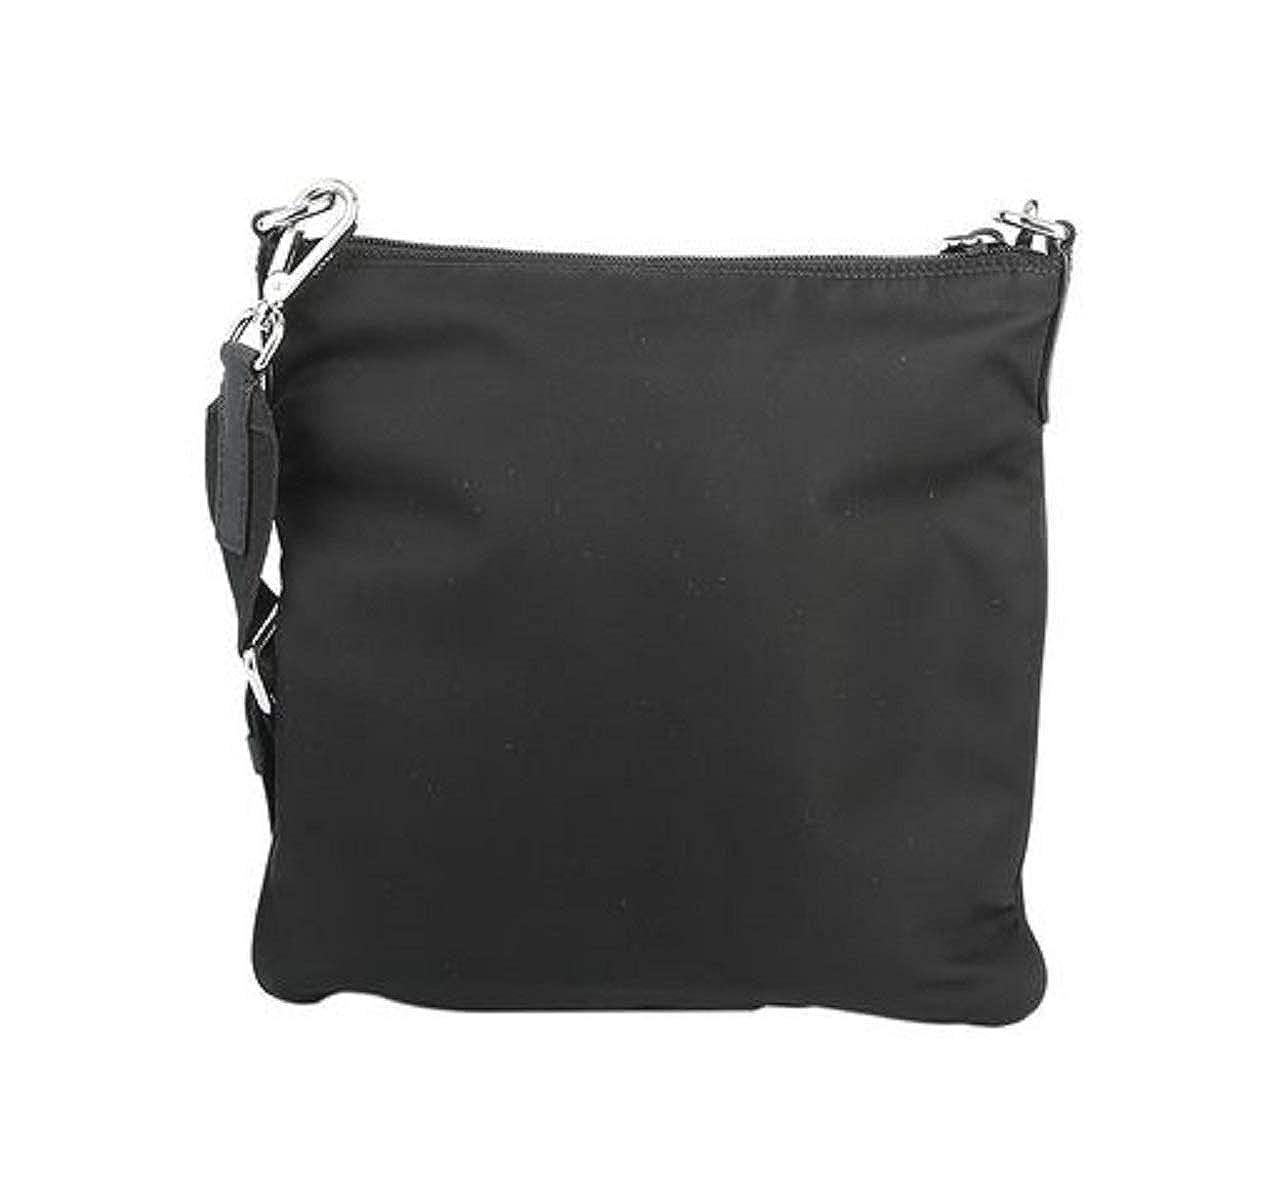 07b3a18d813 Prada Black Tessuto Nylon Messenger Crossbody Handbag 1BH716